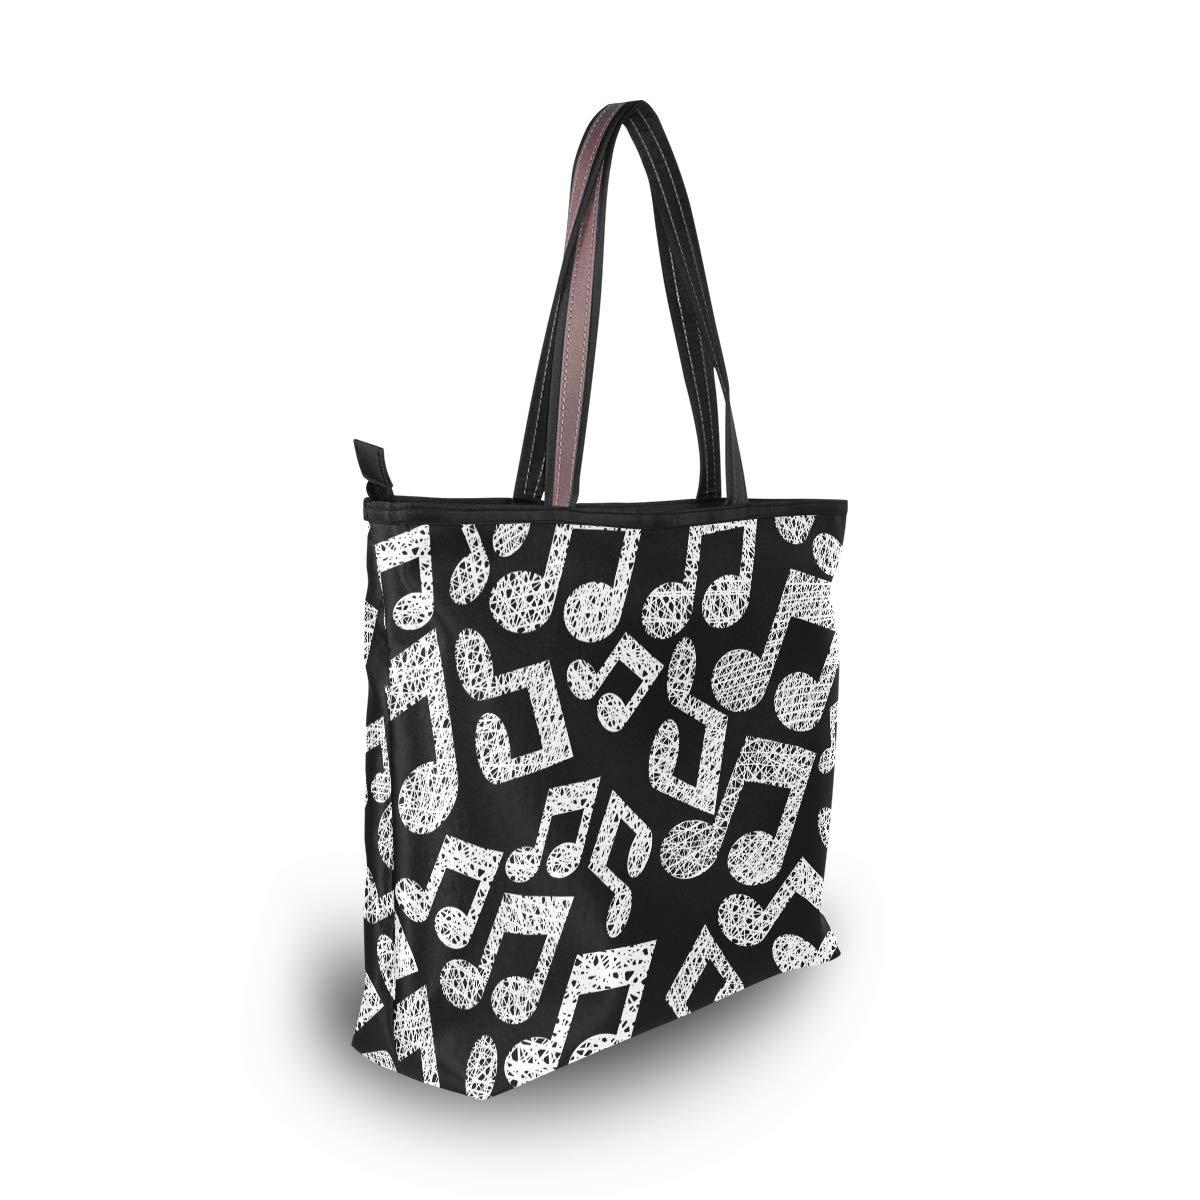 Tote Bag Black And White Music Note Handbag Satchel with Shoulder Length Handles for Women